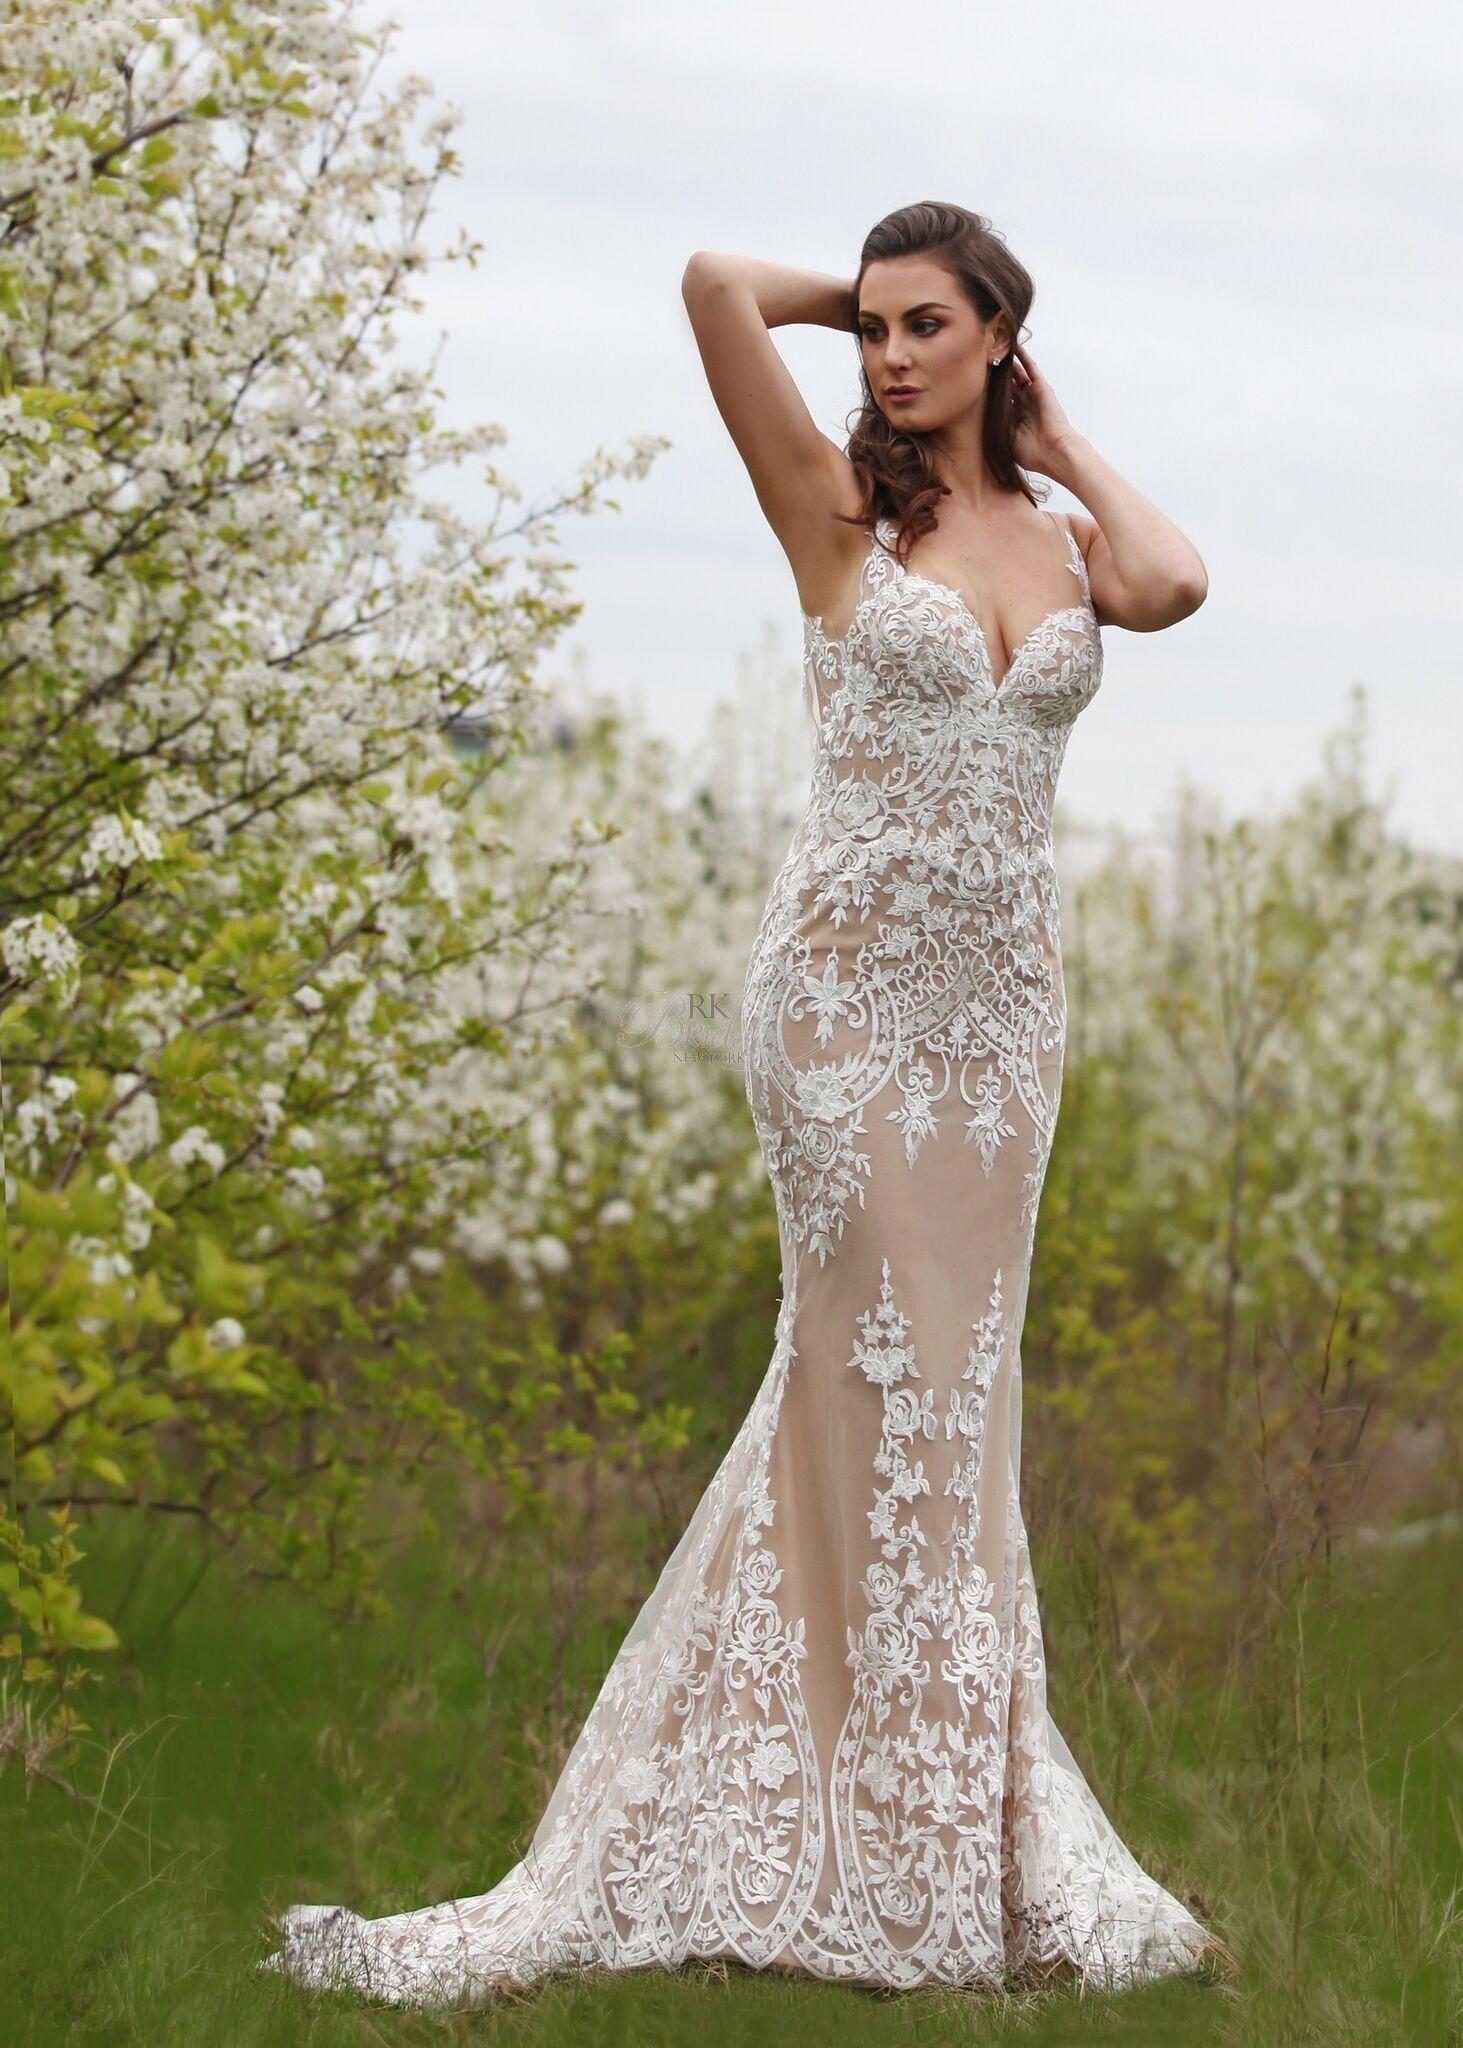 Marisa Bridal Fall 2016- Style D99 | Elope | Pinterest | Wedding ...